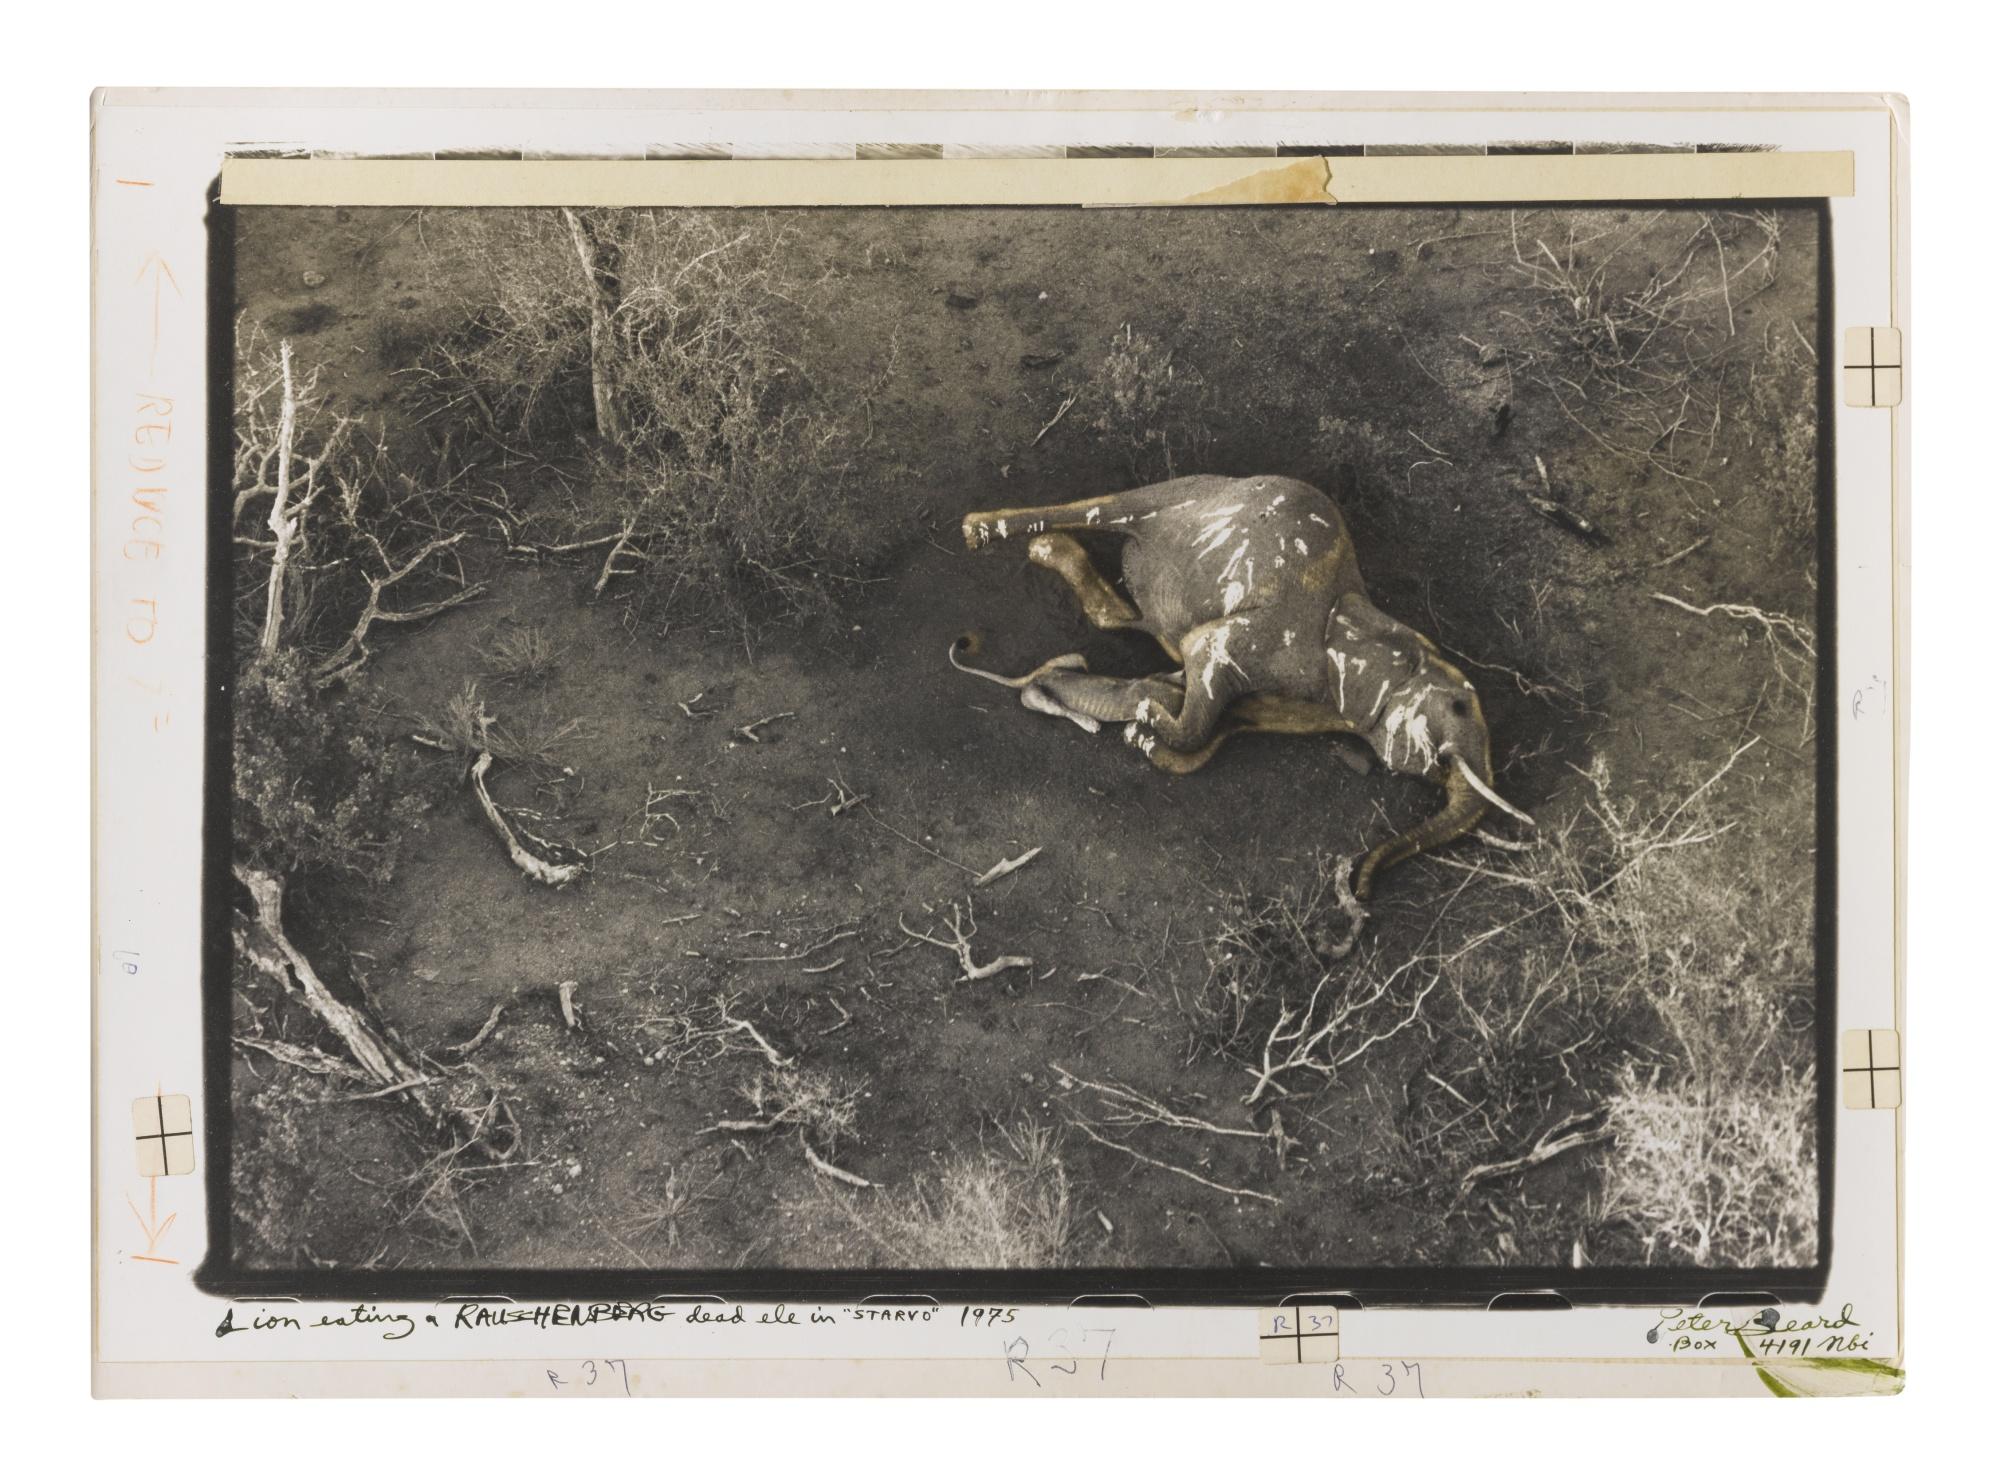 Peter Beard-Lion Eating A Rauschenberg Dead Ele In Starvo 1975-1975